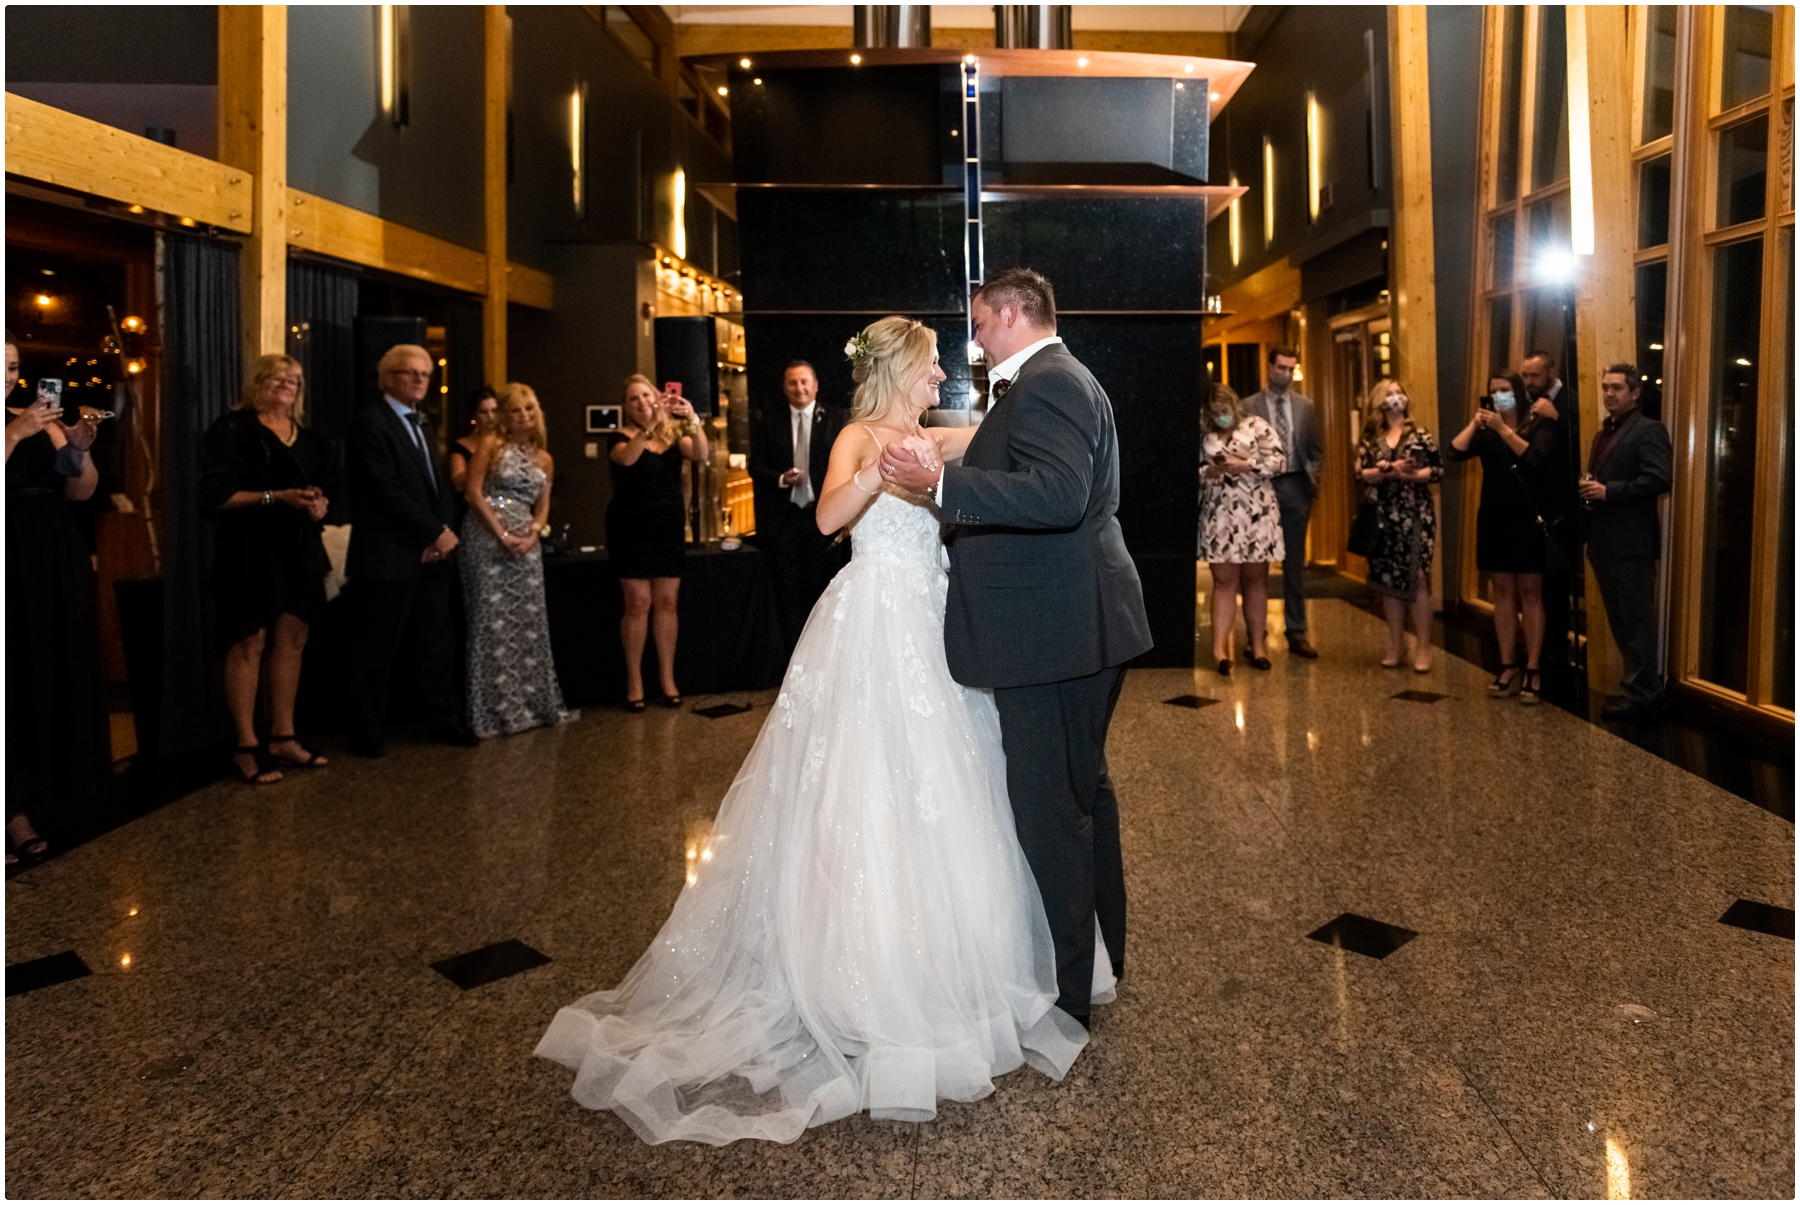 Azuridge Estate Hotel Wedding Reception Photo- Calgary Wedding Photographer